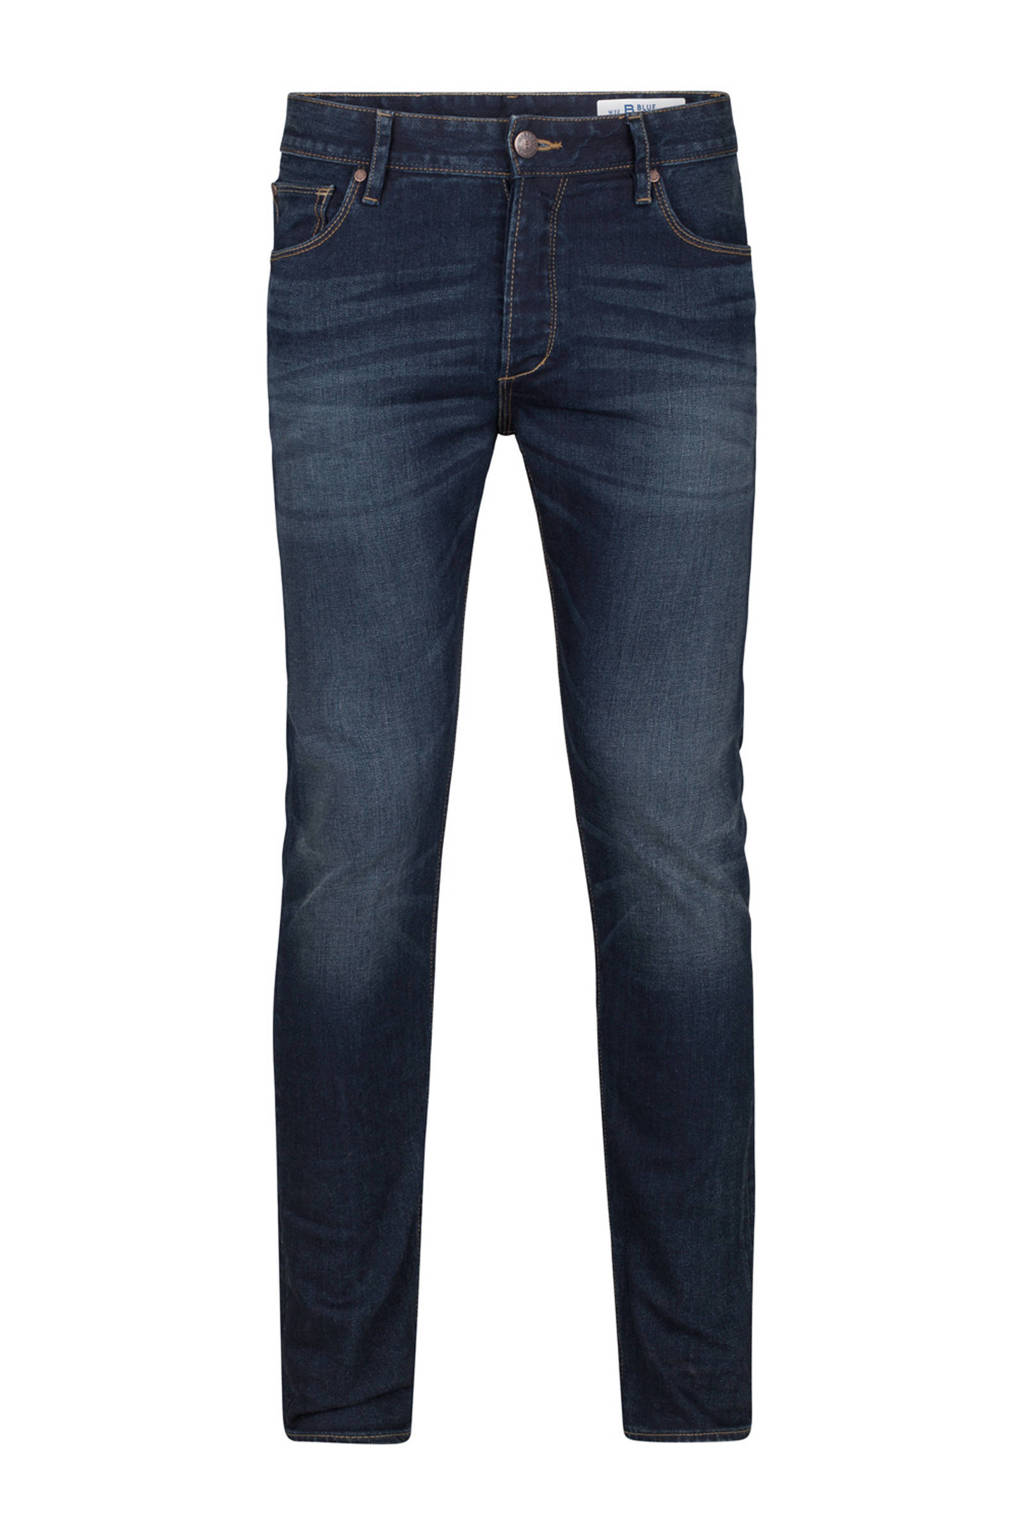 WE Fashion Blue Ridge blue ridge regular skinny fit jeans, Blue denim